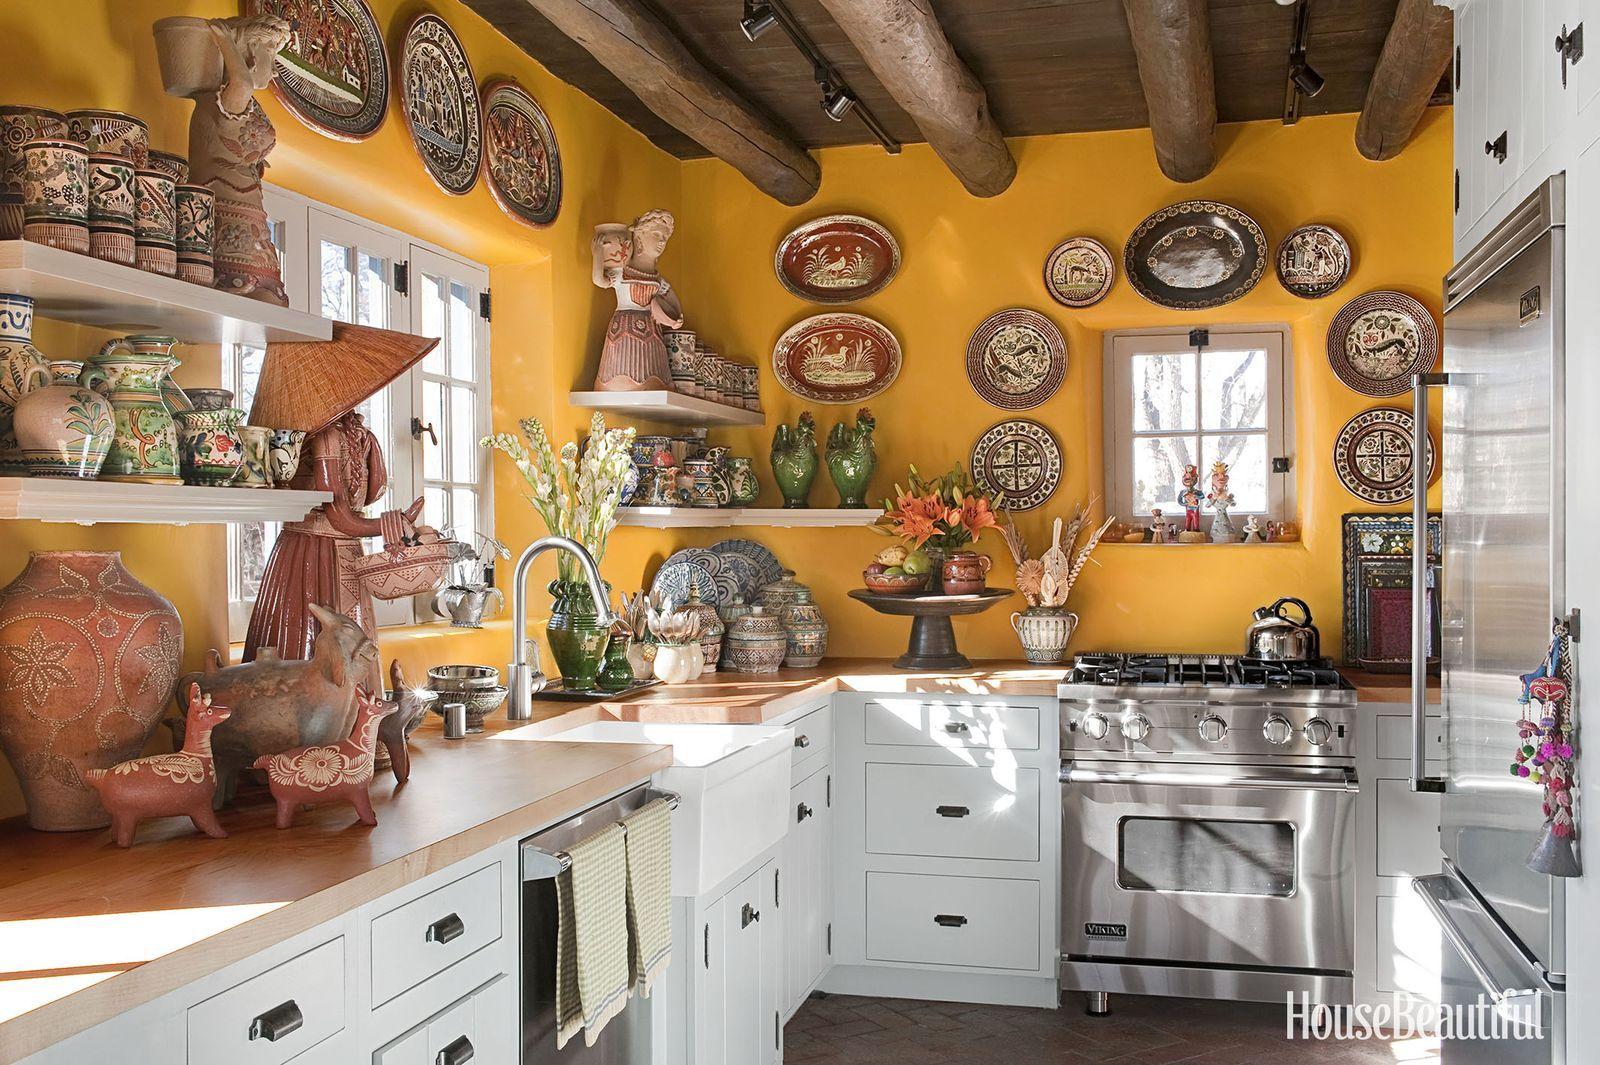 8 5 Plate From Puebla Mexico Talavera Pottery Blue White Kitchen Southwestern Kitchen Wall Decor In 2021 Talavera Pottery Kitchen Wall Decor Blue White Kitchens